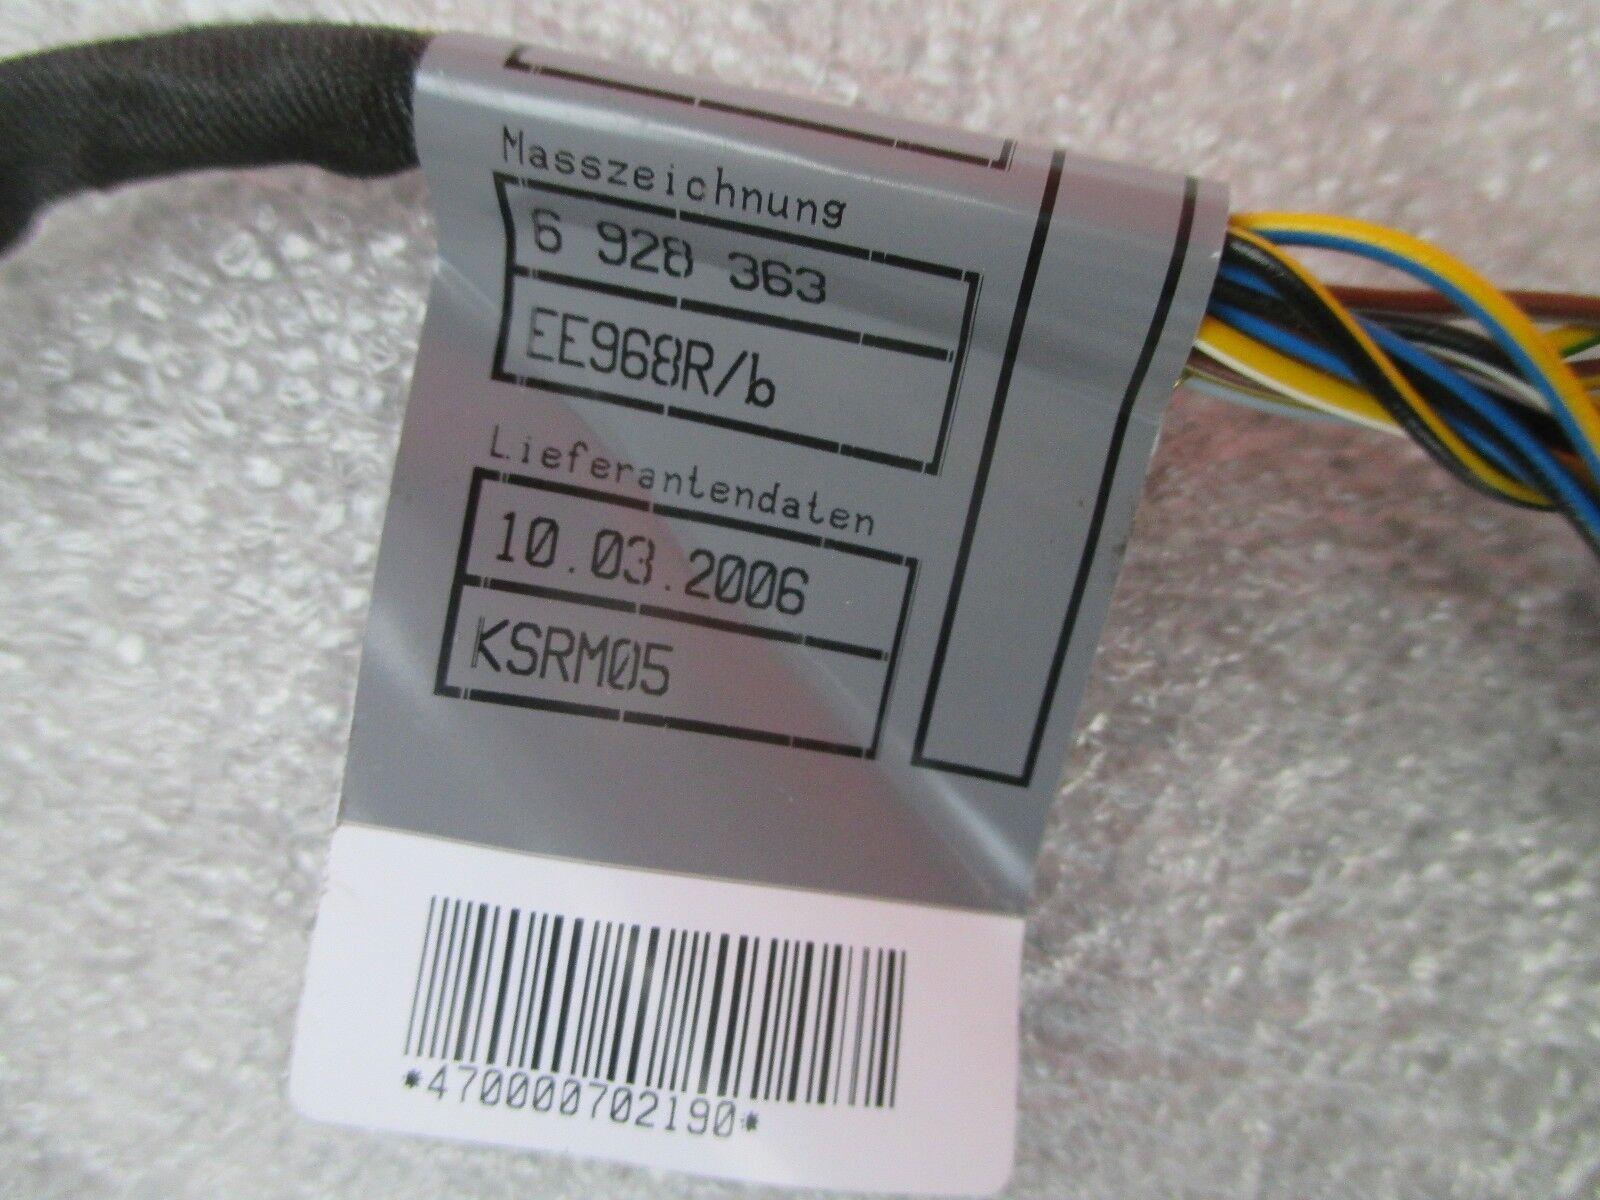 04-07 BMW M5 E60 530i 545i Rear Bumper PDC Sensor Harness Plug OEM  61126928363 | eBay